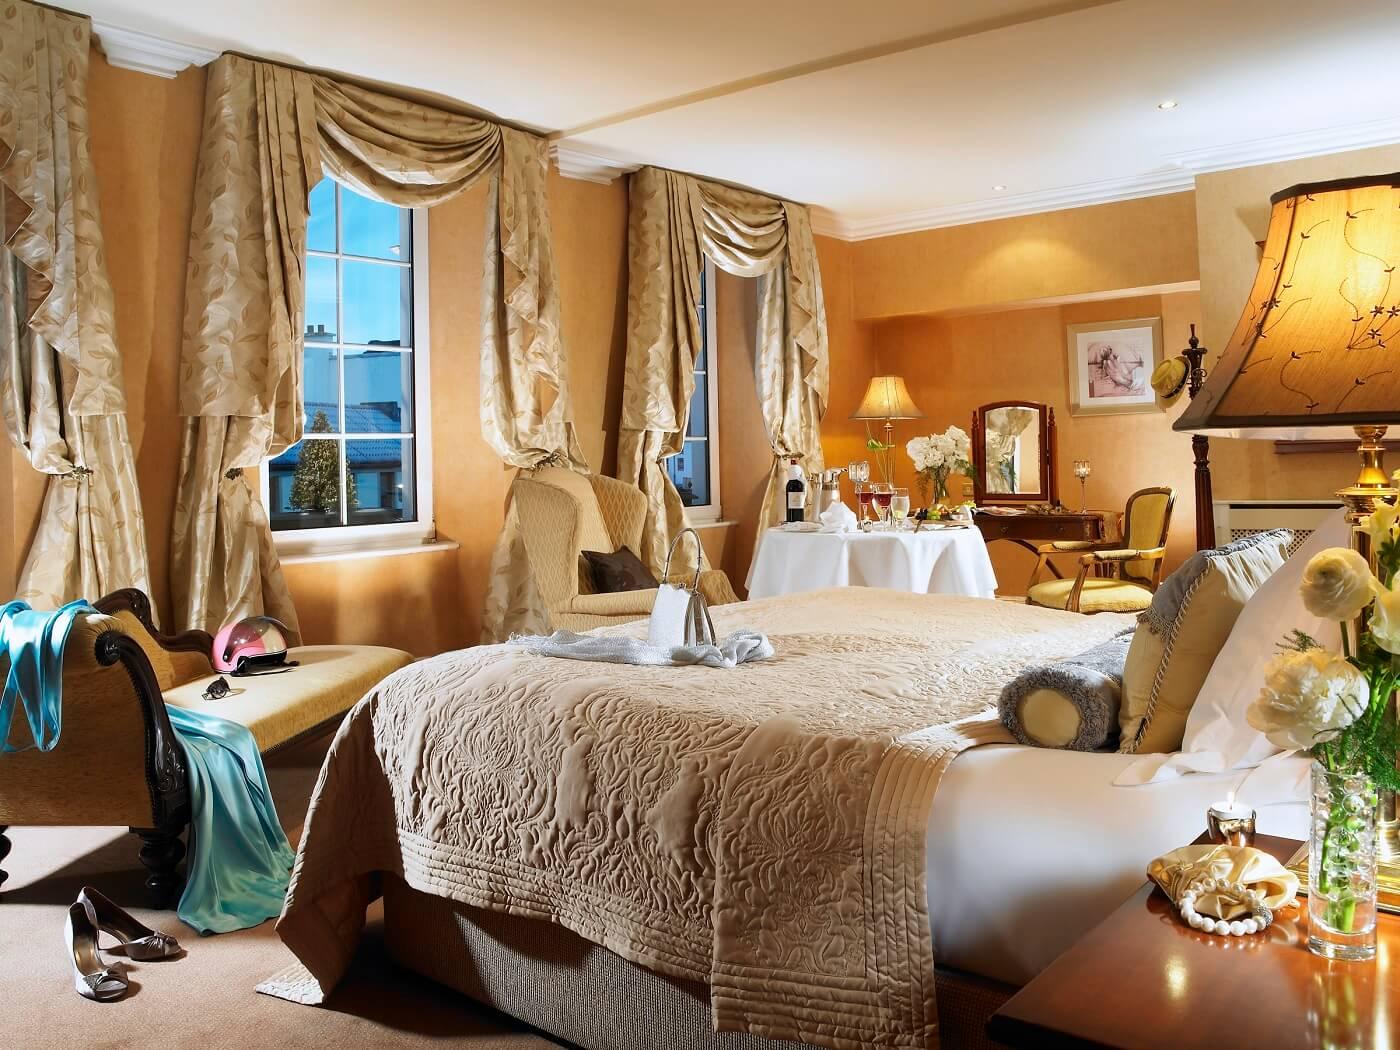 relax in luxury at Killarney Royal